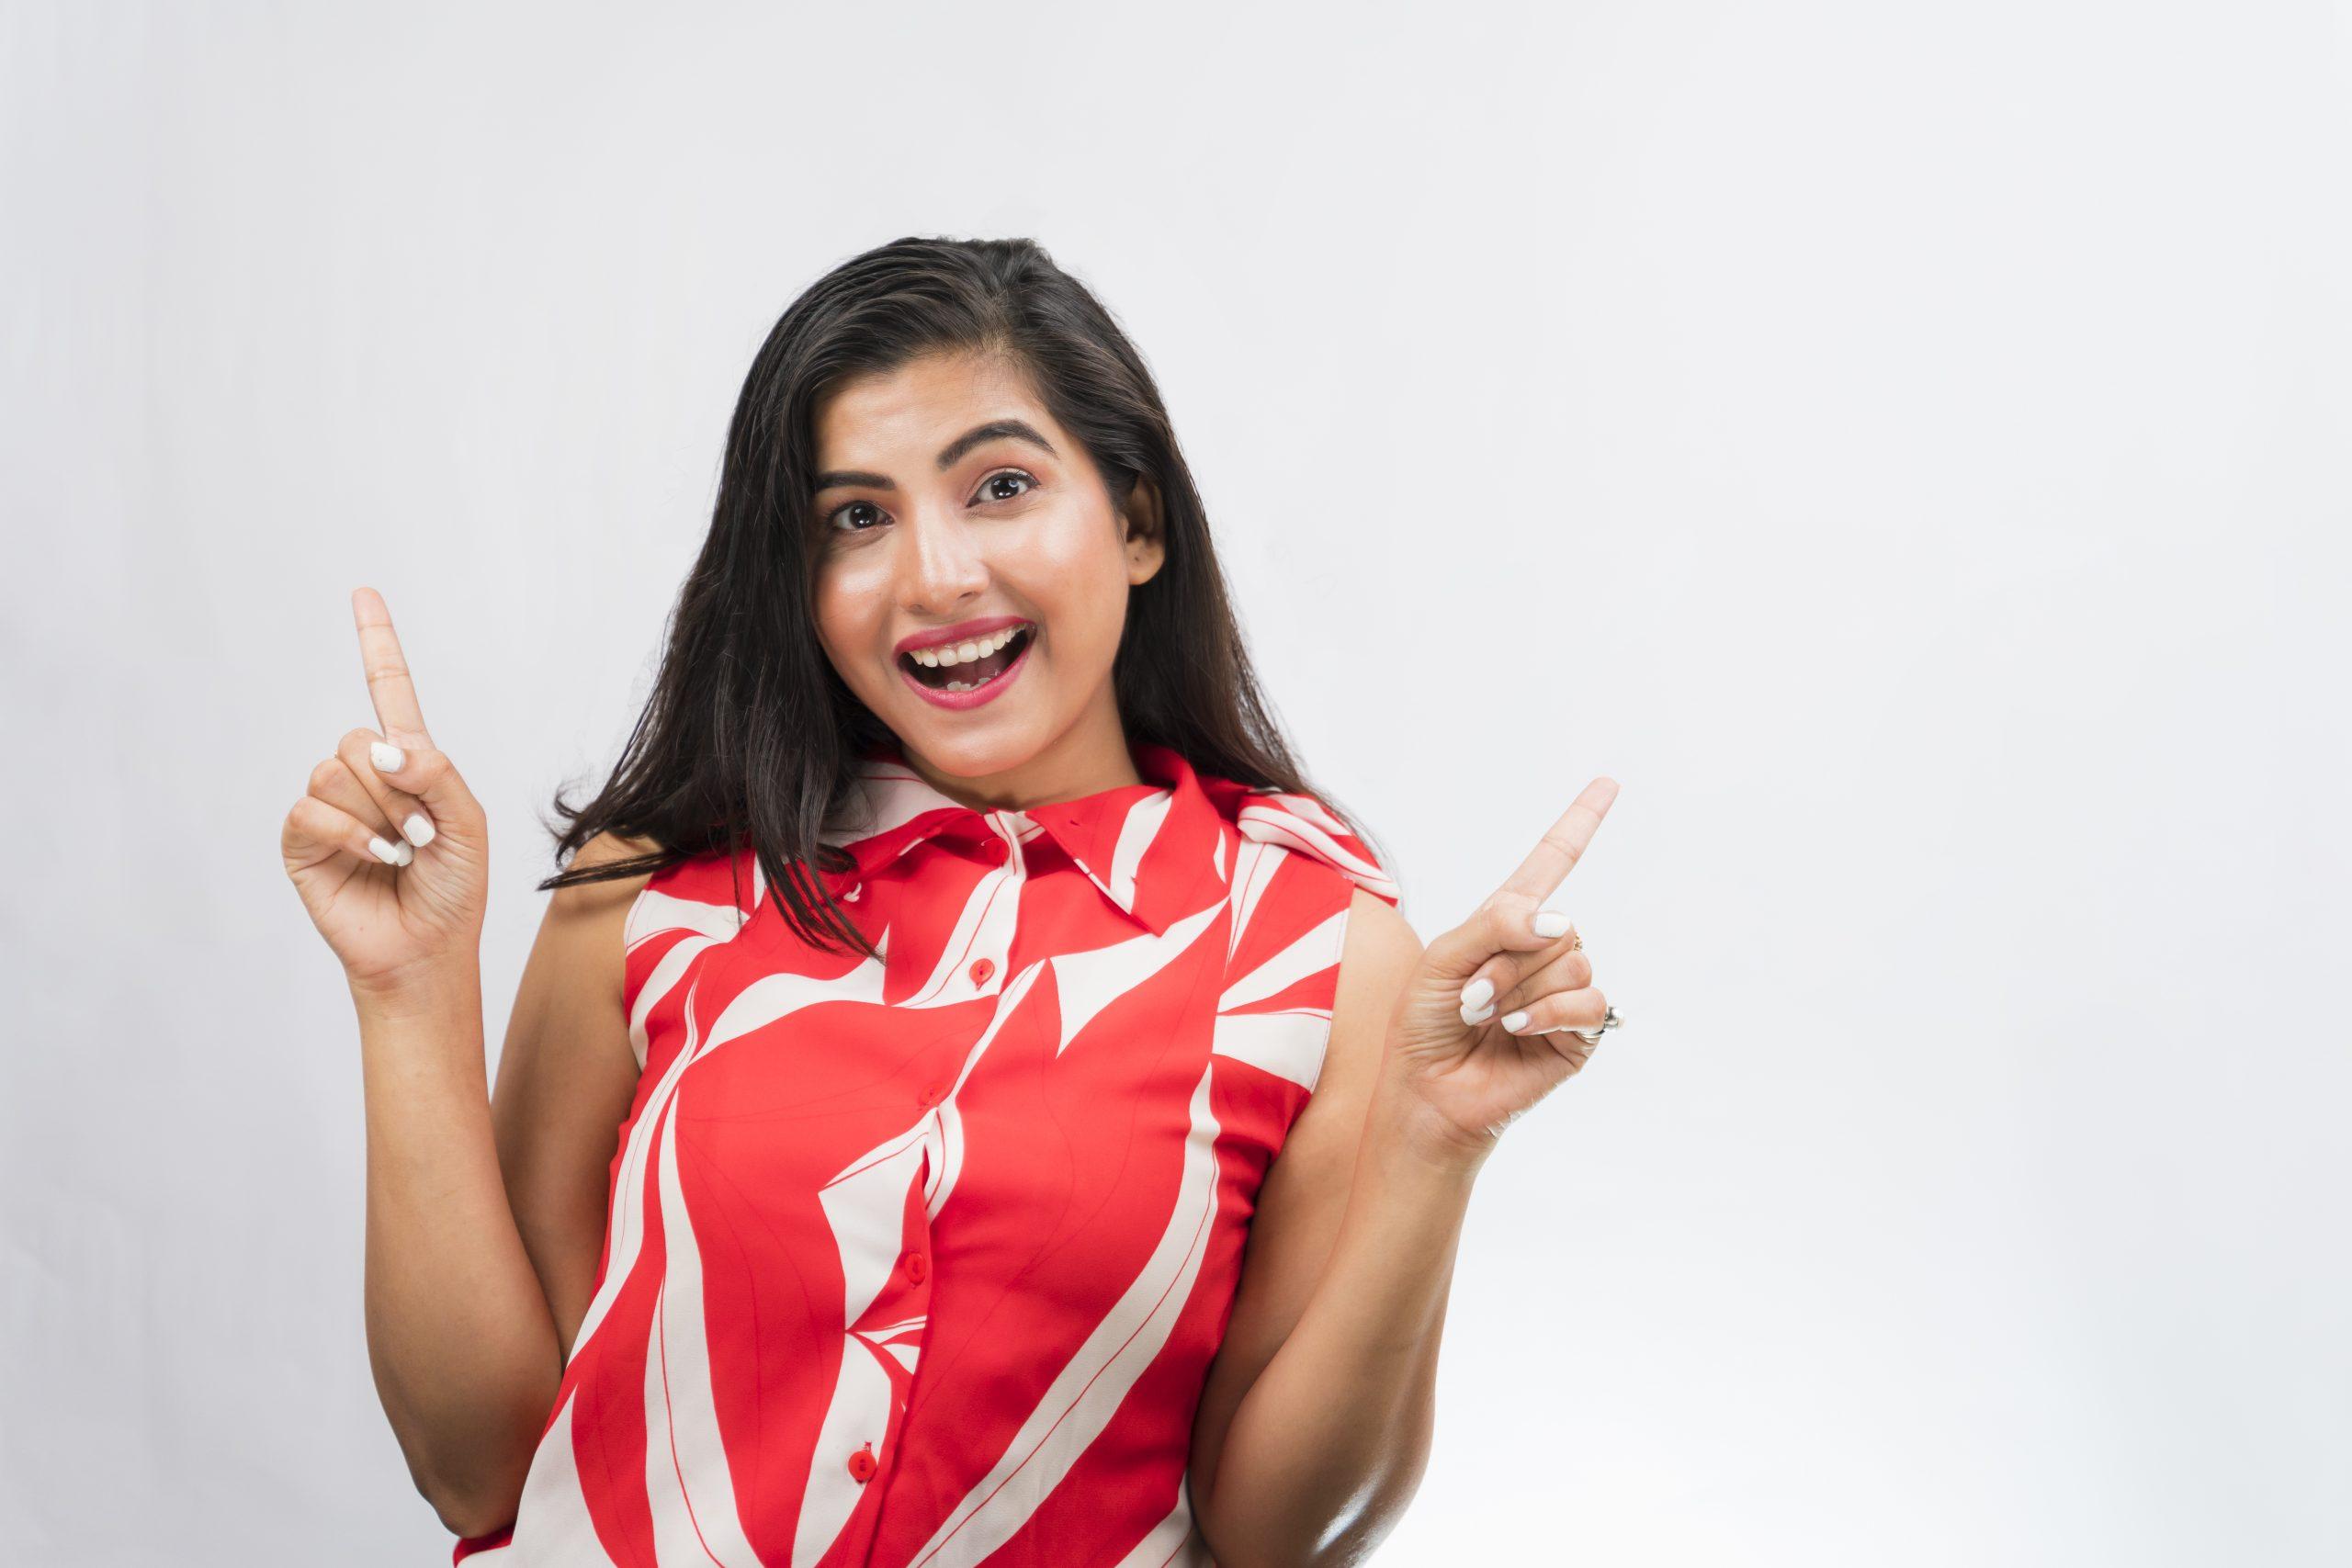 Happy Indian girl pointing upwards